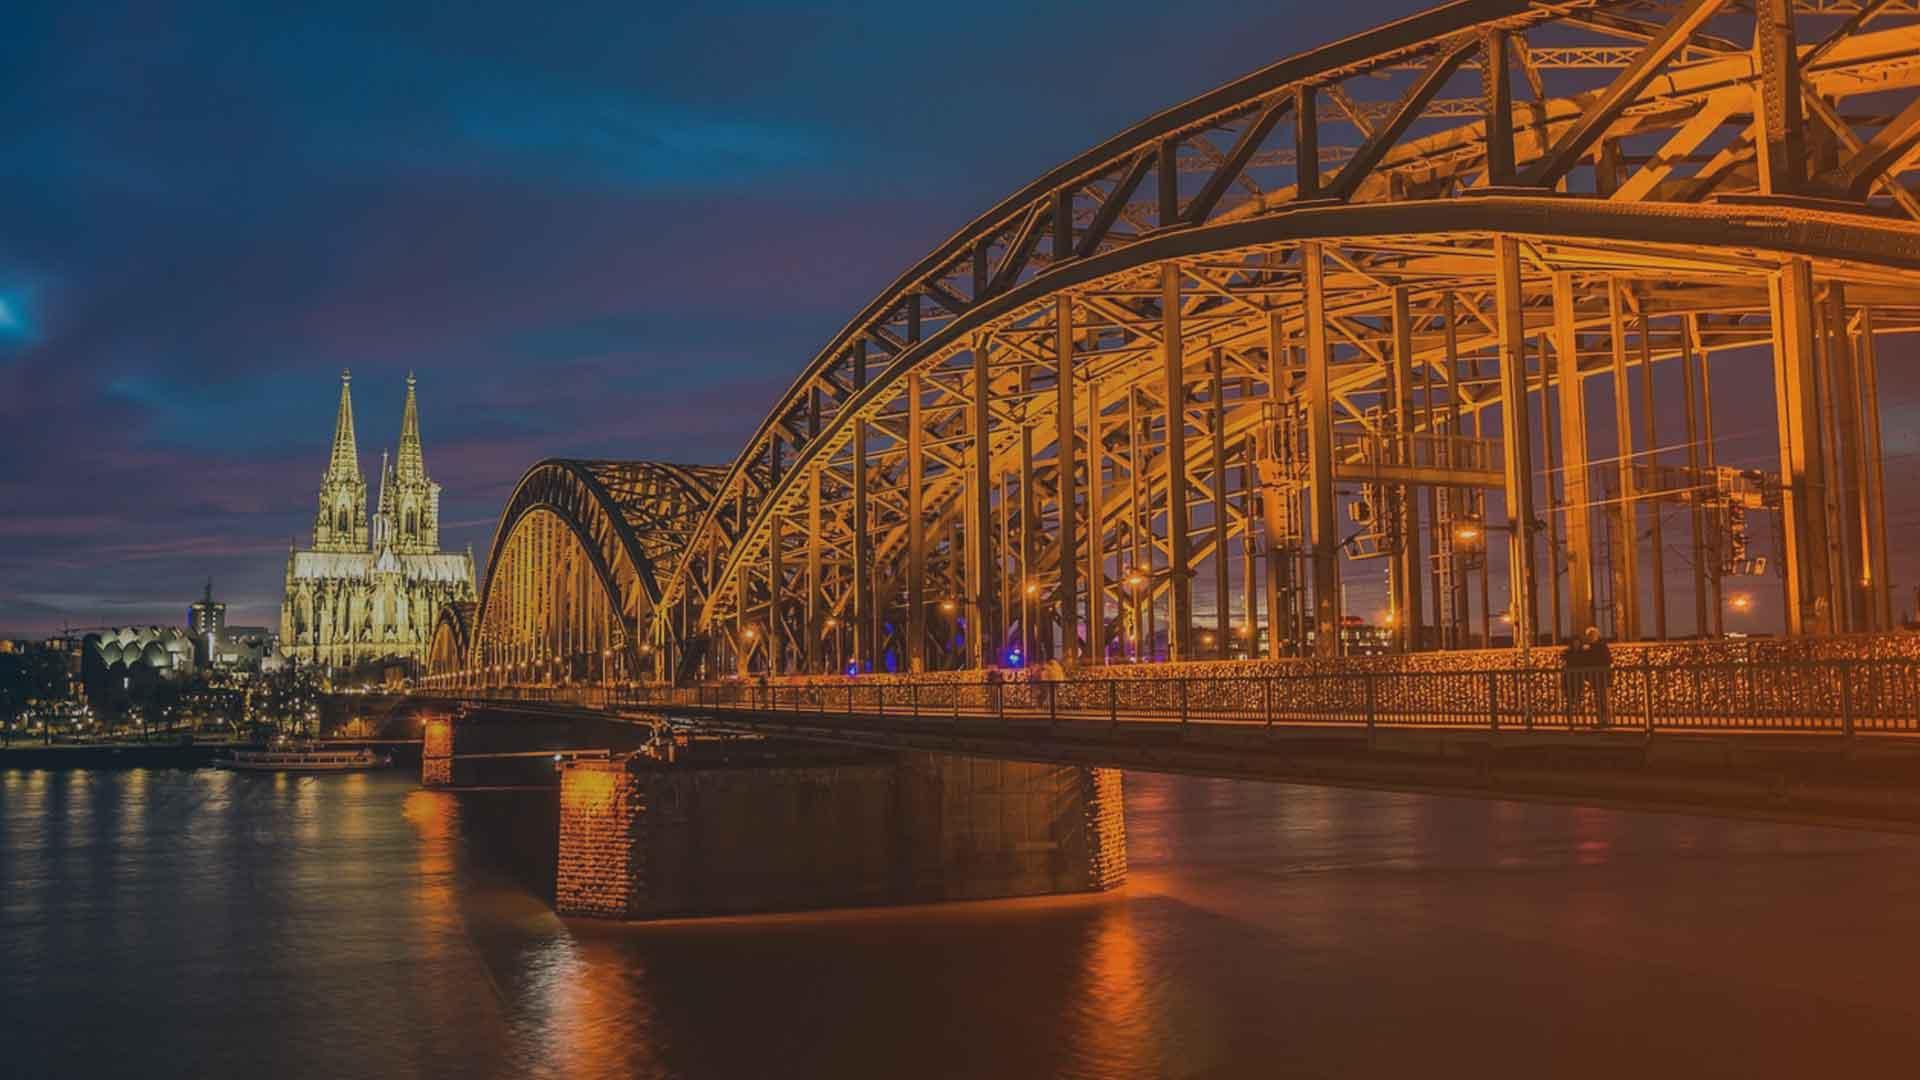 Bericht aus Köln